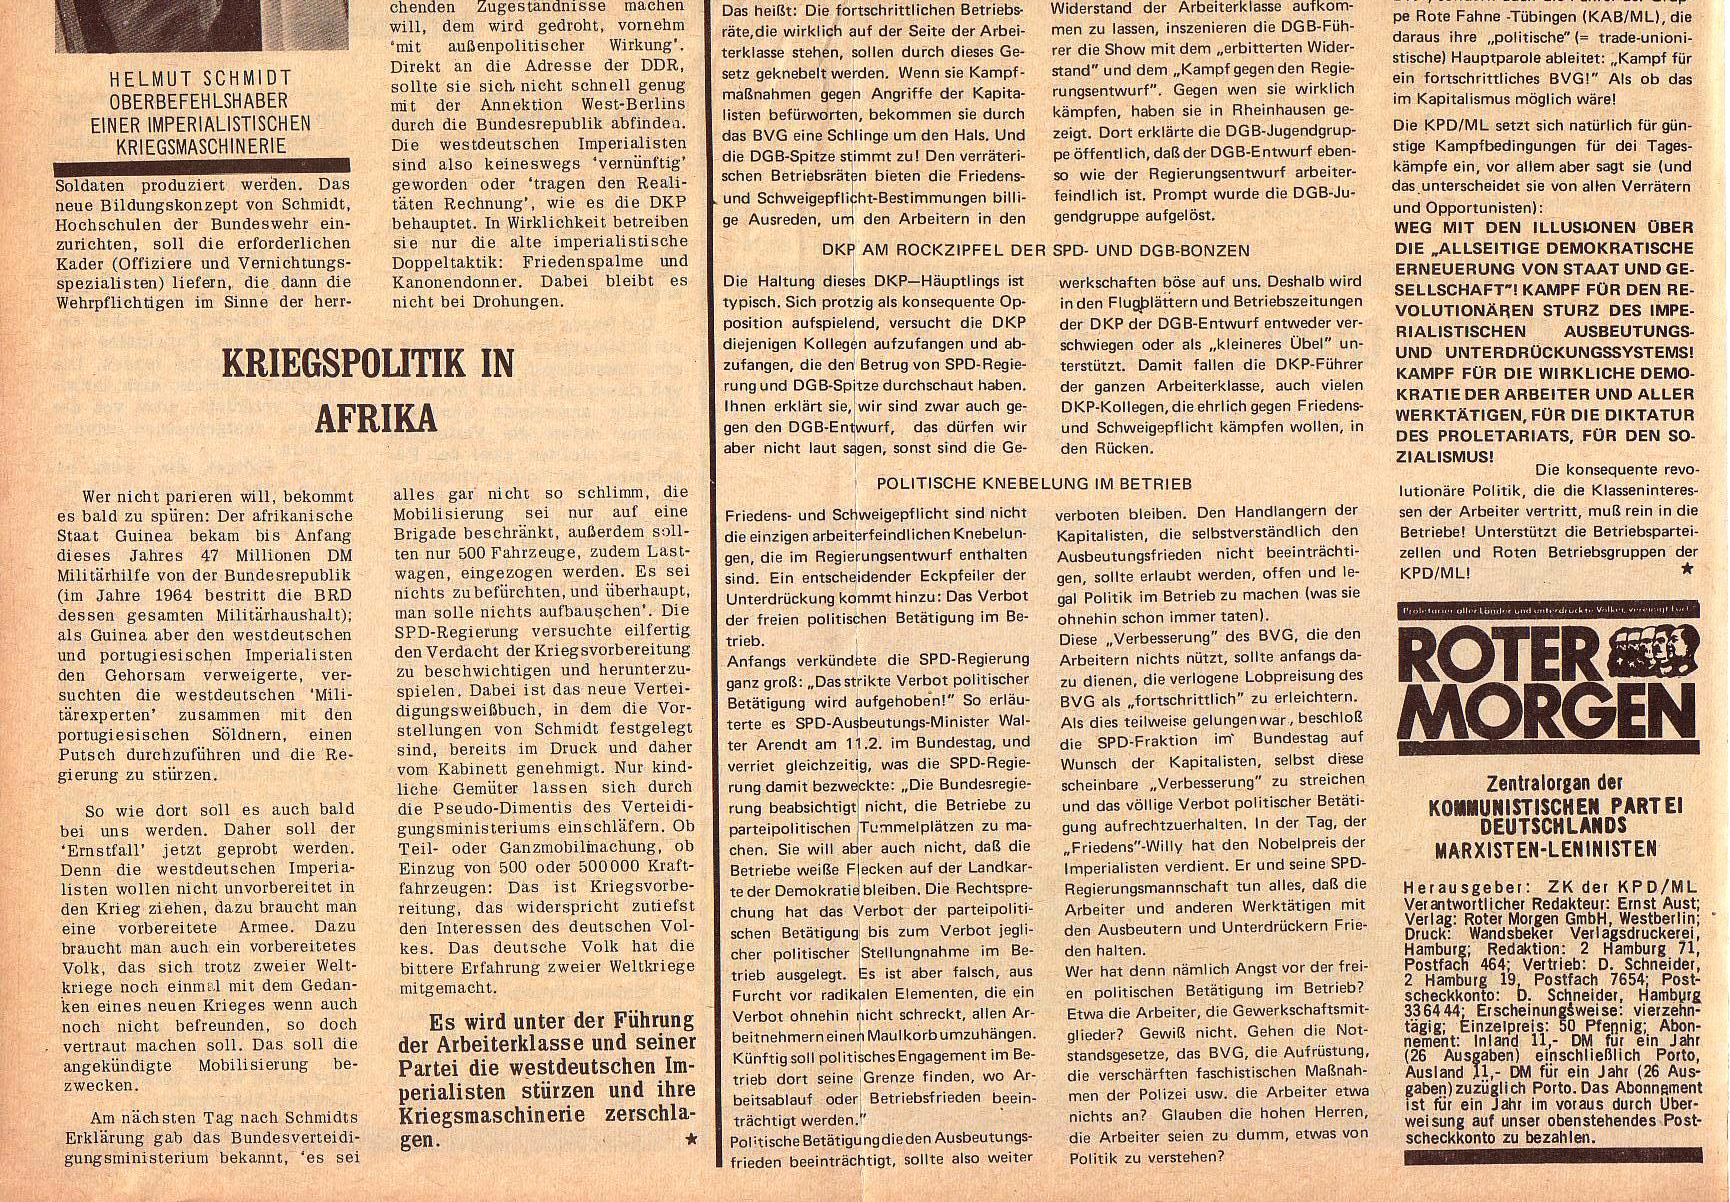 Roter Morgen, 5. Jg., 22. November 1971, Nr. 14, Seite 2b